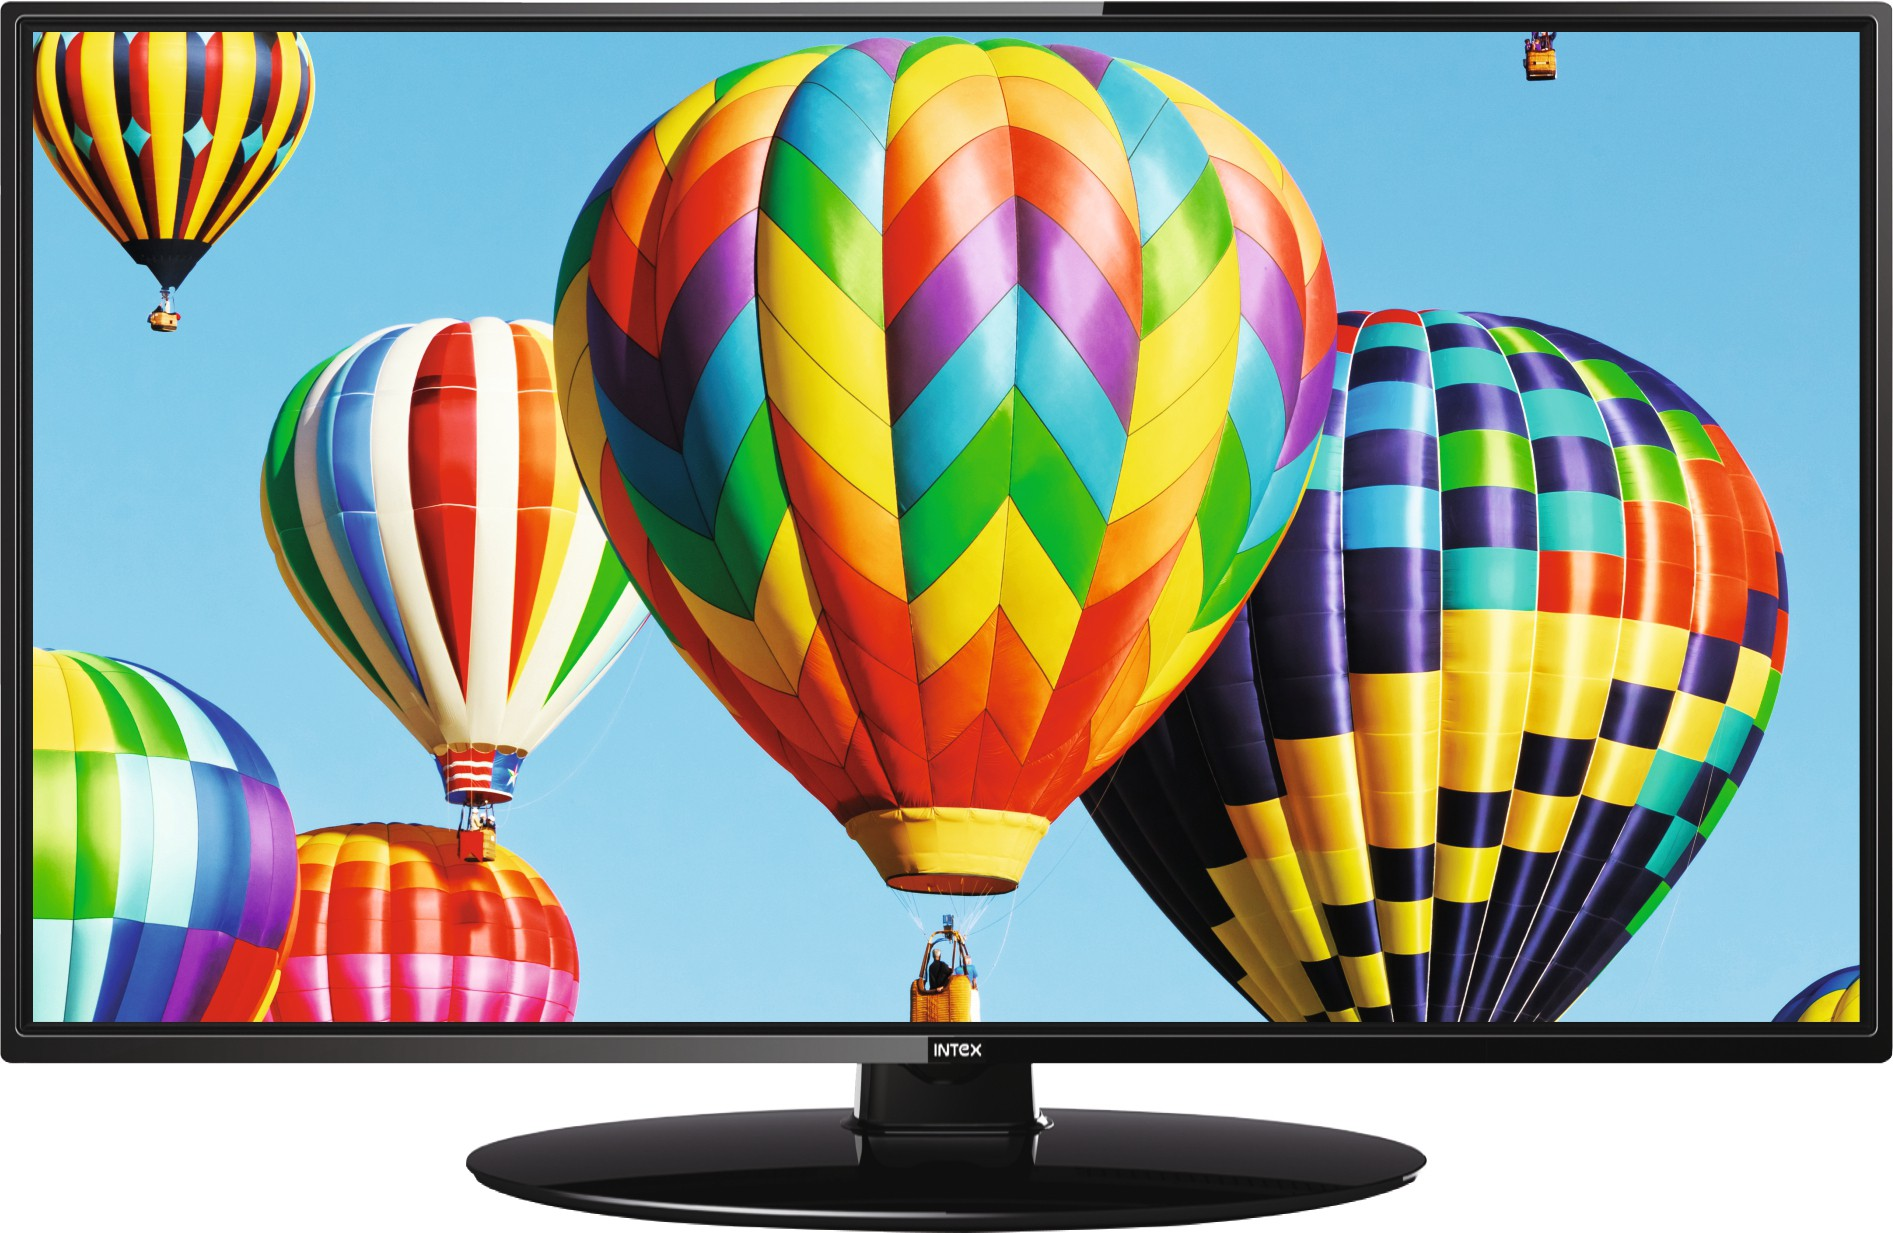 INTEX 3210 32 Inches HD Ready LED TV